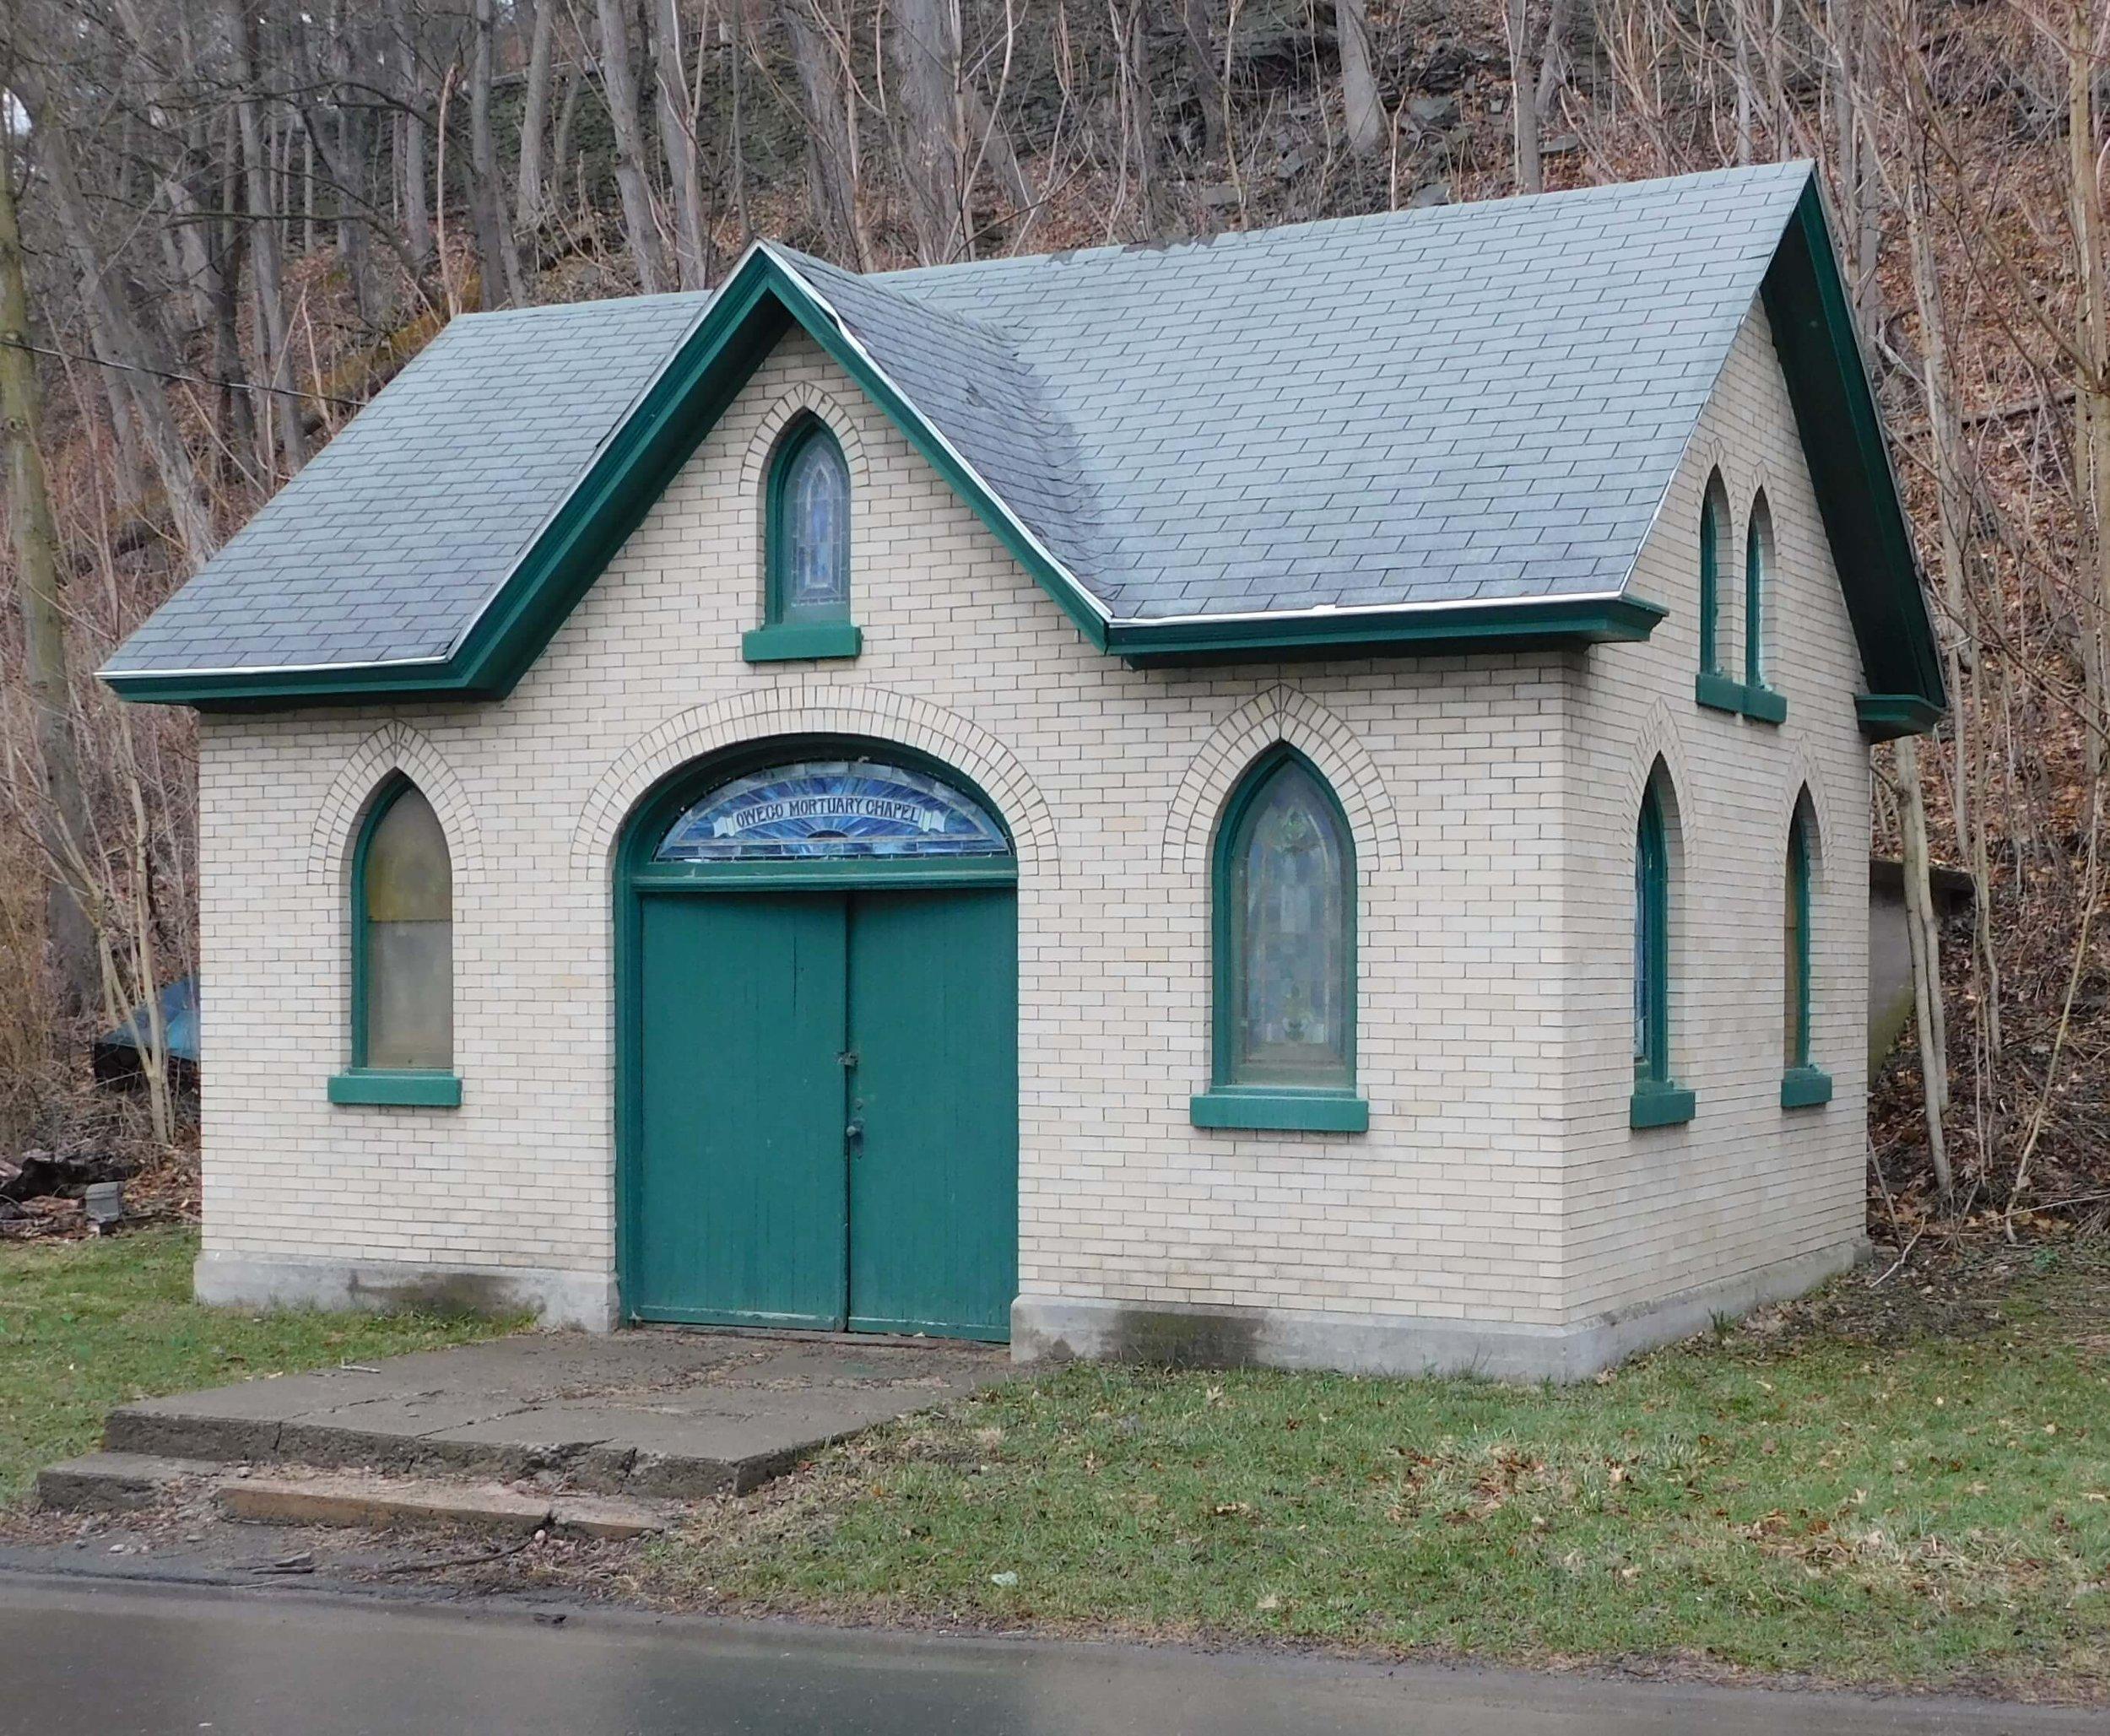 Tioga County: Village of Owego - Evergreen Cemetery Cultural Landscape Report